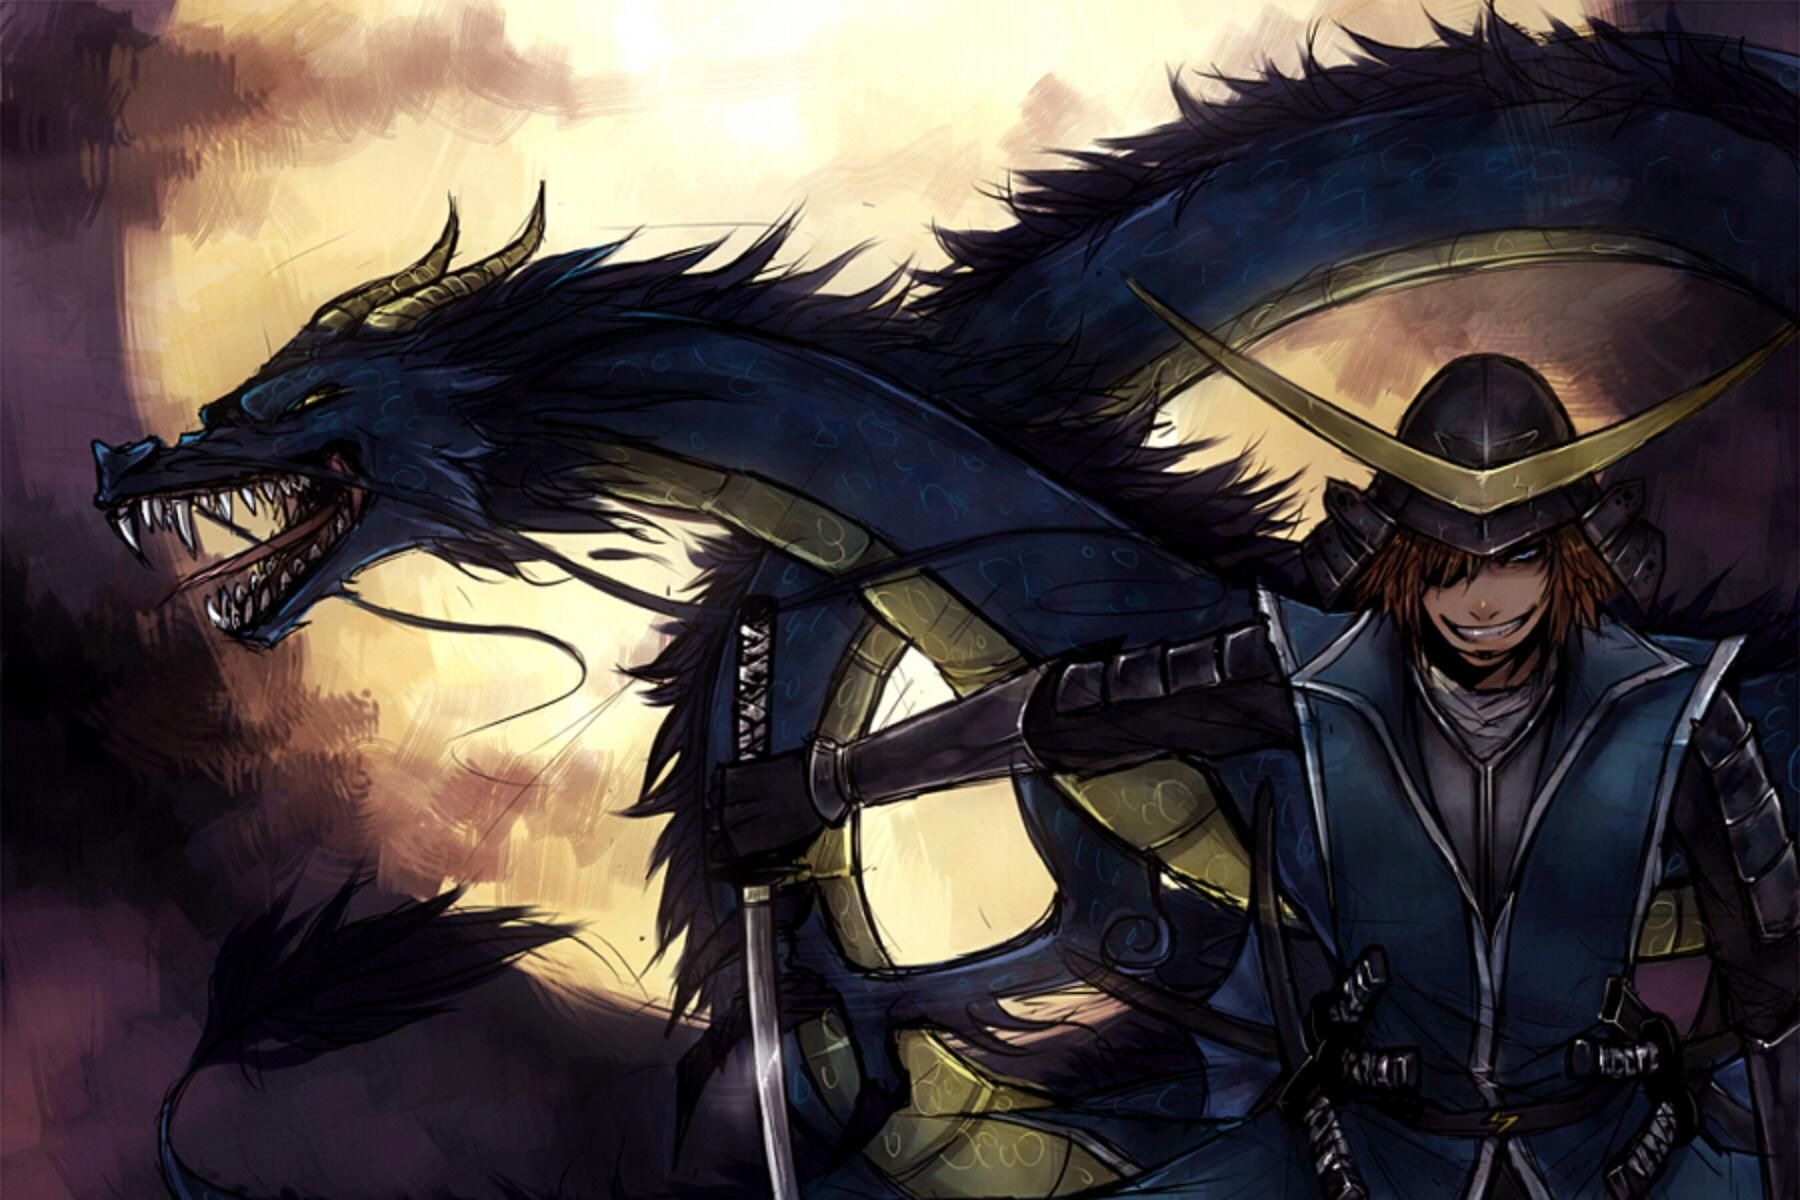 Date Masamune, The Oneeyed Dragon Date masamune, Basara